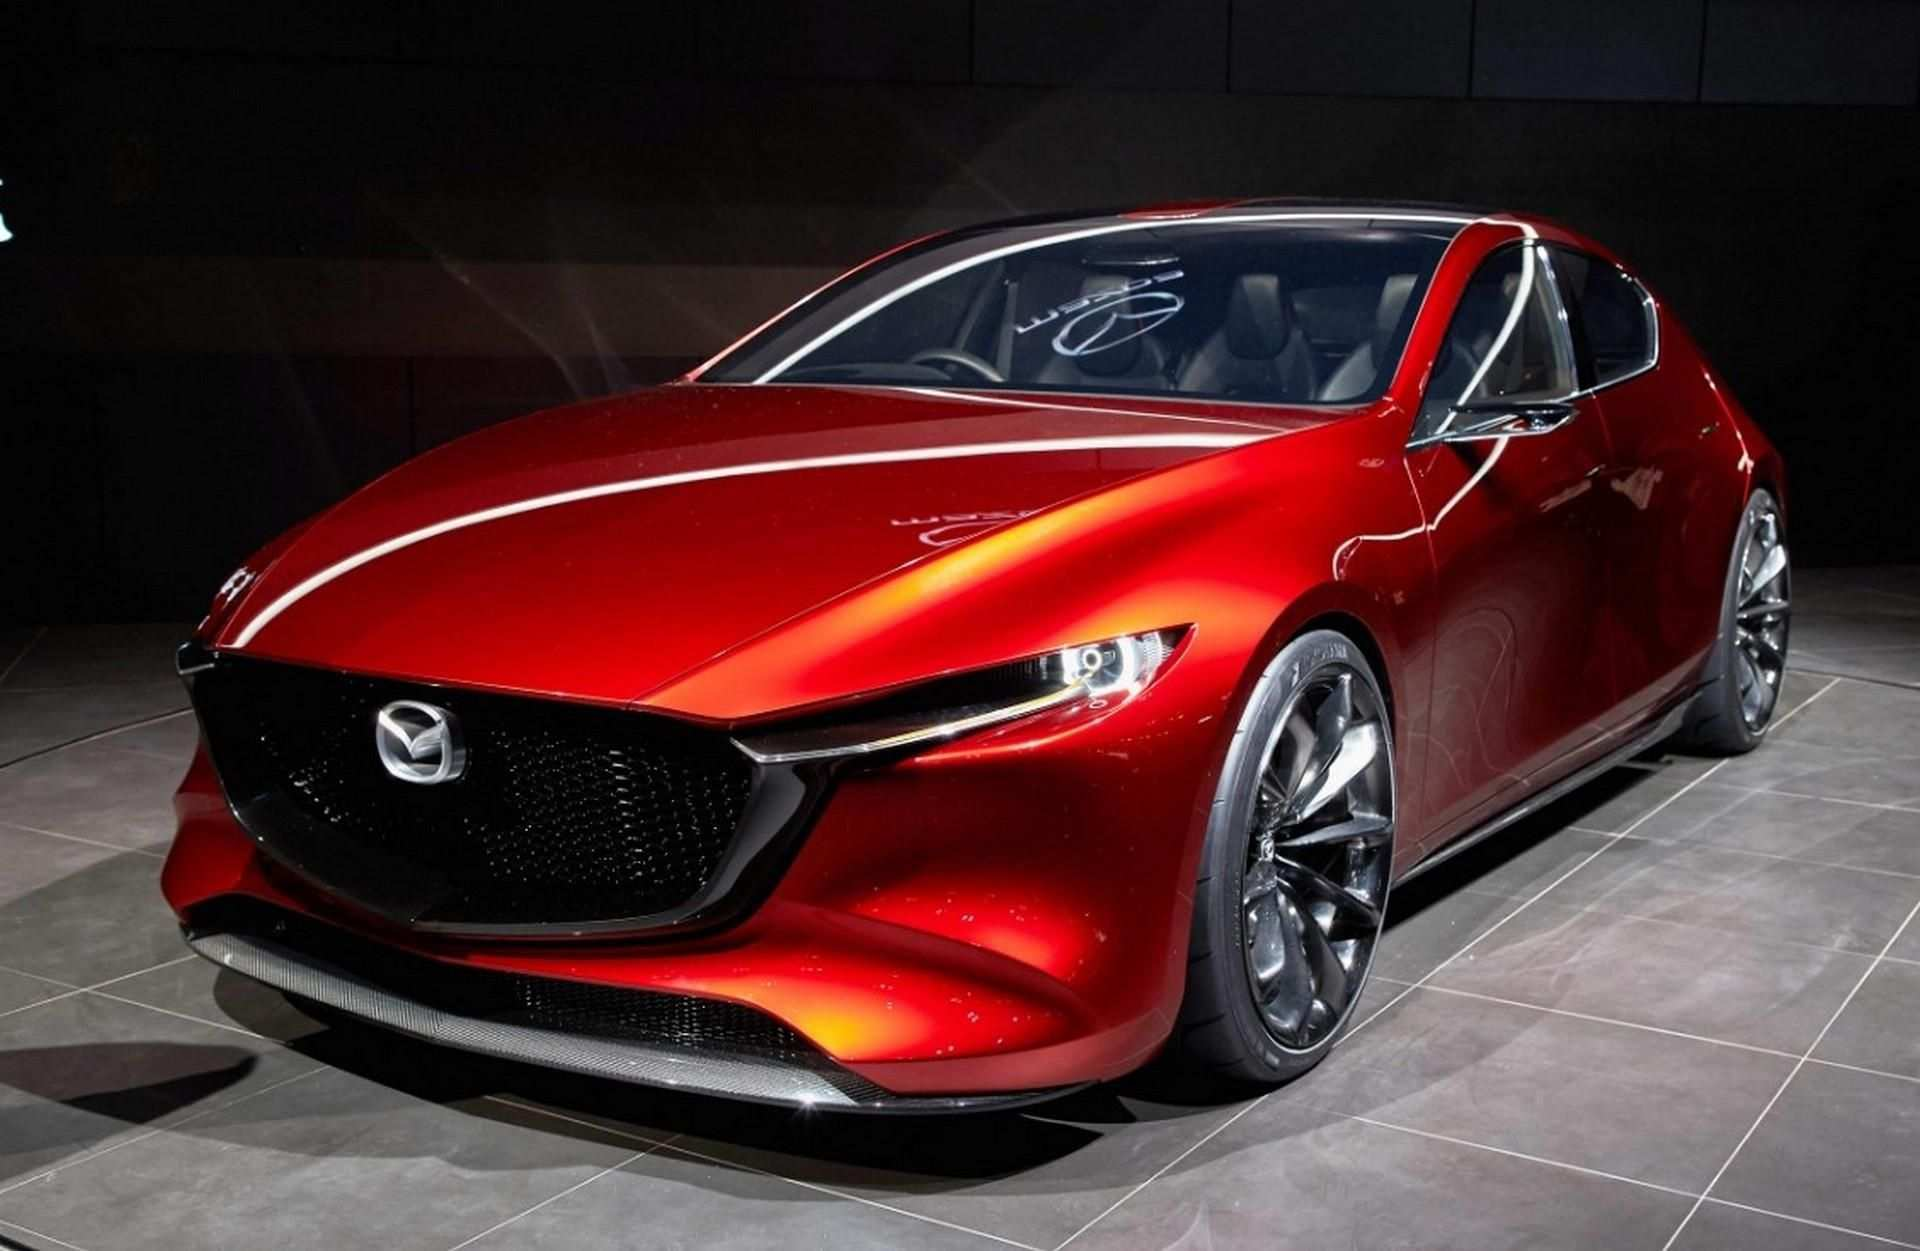 55 Best Review New Mazda Kodo 2019 Release Date Price and Review by New Mazda Kodo 2019 Release Date